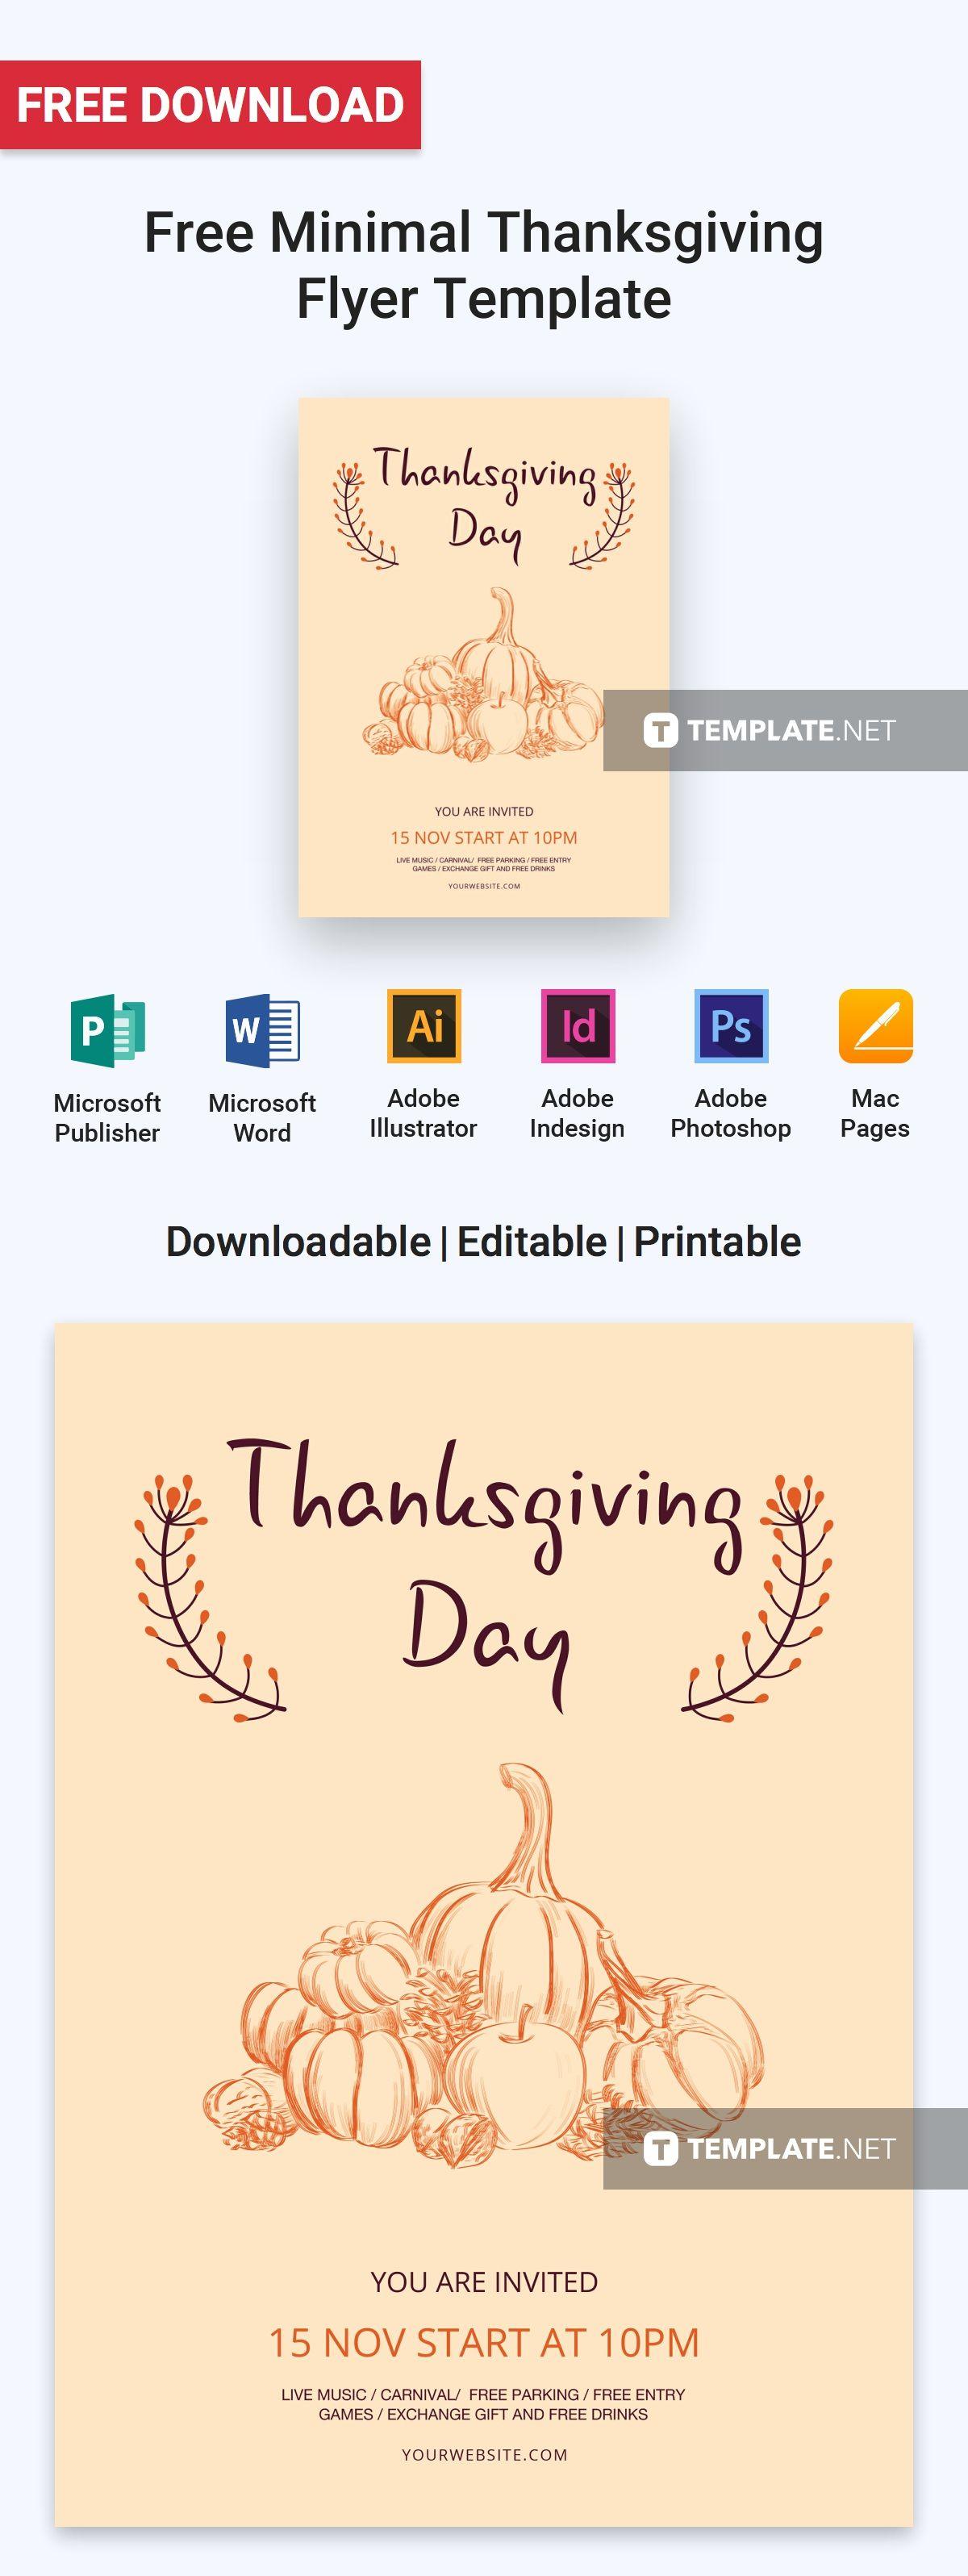 Free Minimal Thanksgiving Flyer Flyer Template Free Flyer